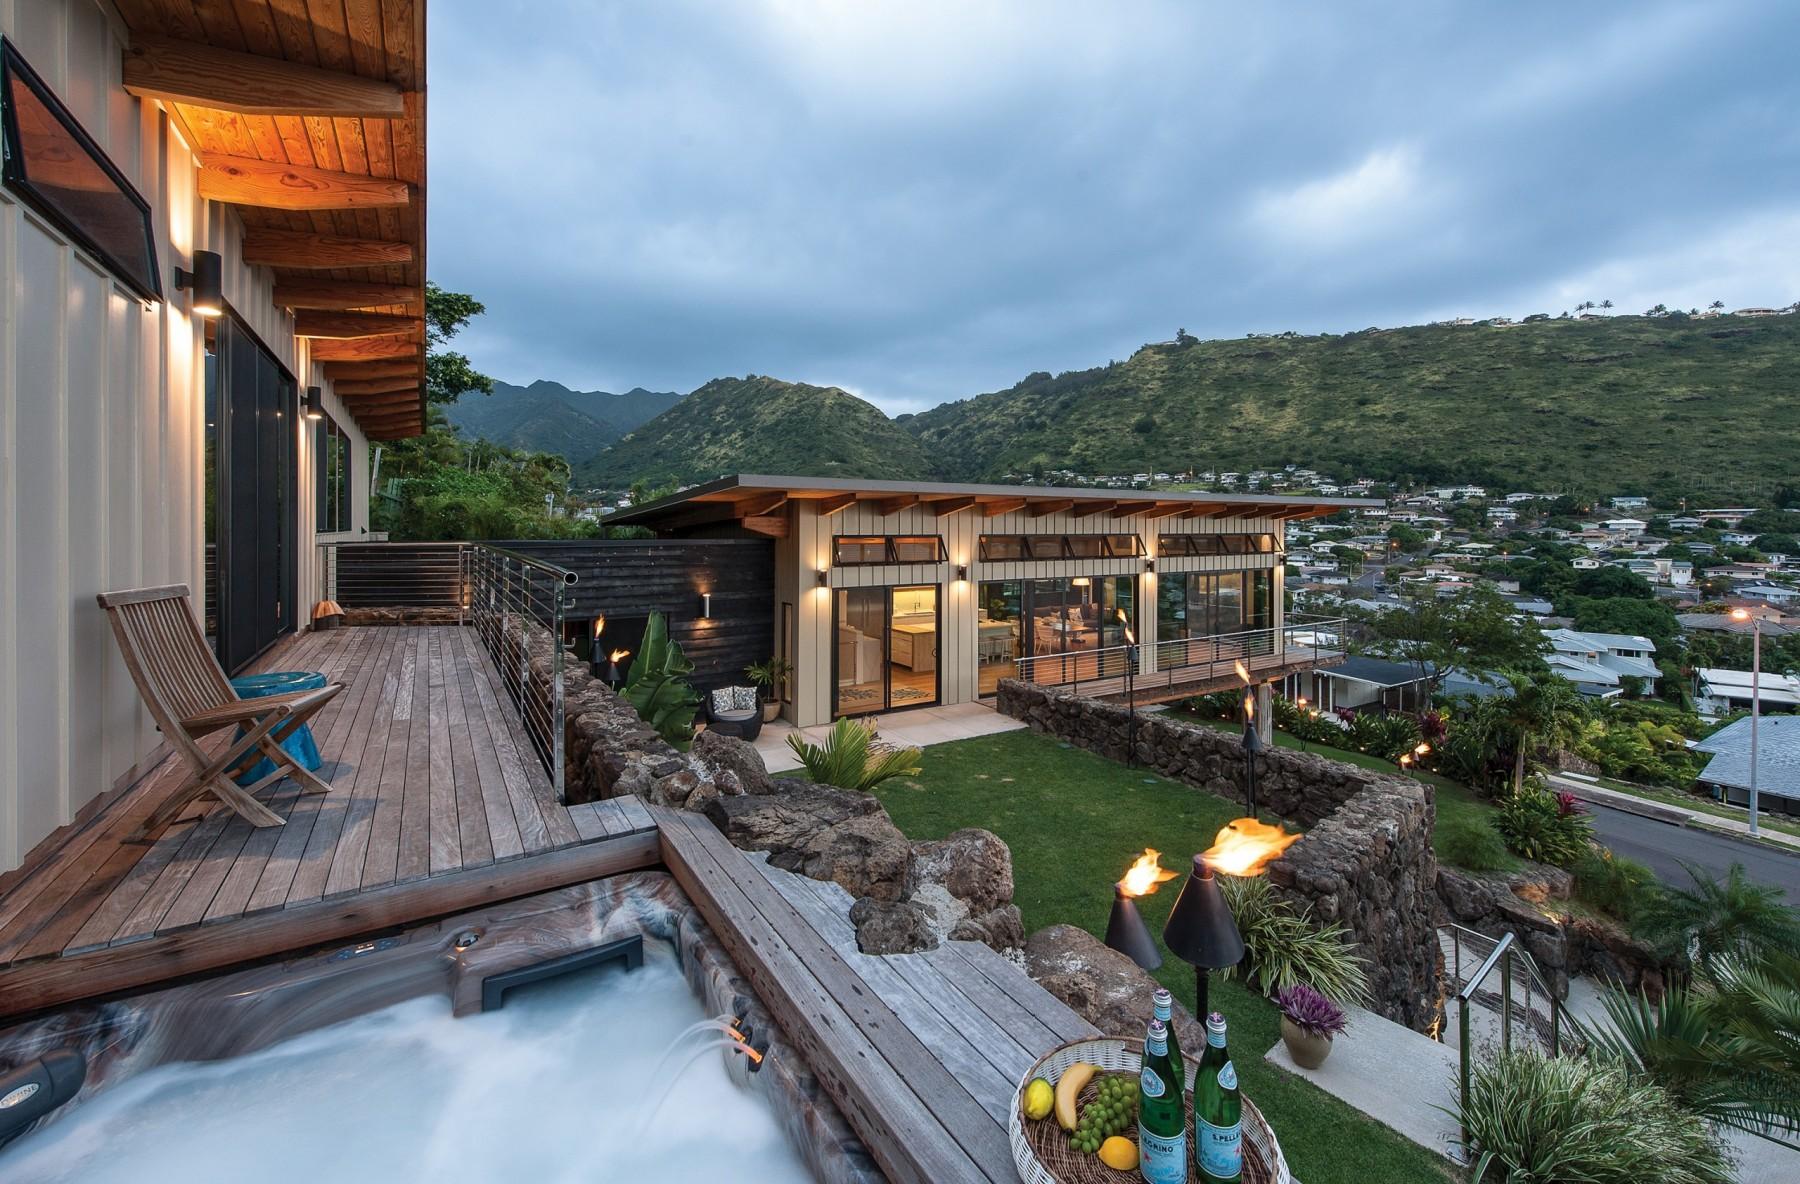 07 21 Hhr Feature Build Oahu 2